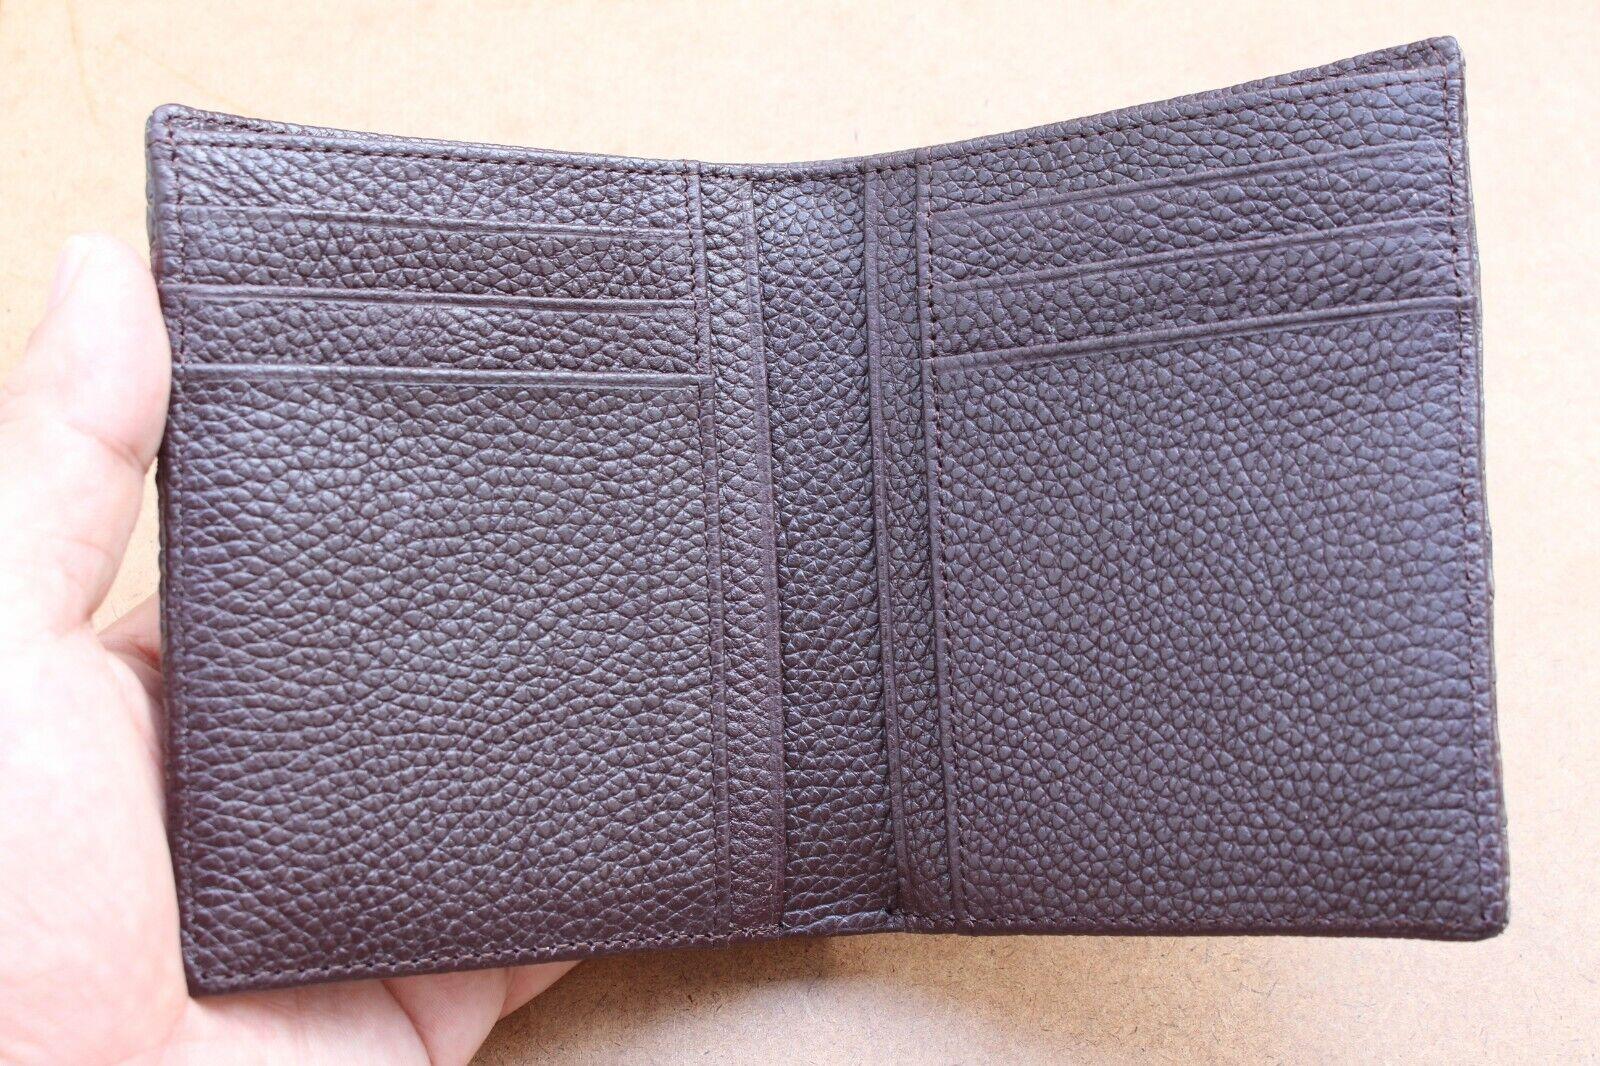 Genuine Alligator Crocodile Leather Skin Men Bifold Wallet Handmade Brown #N70